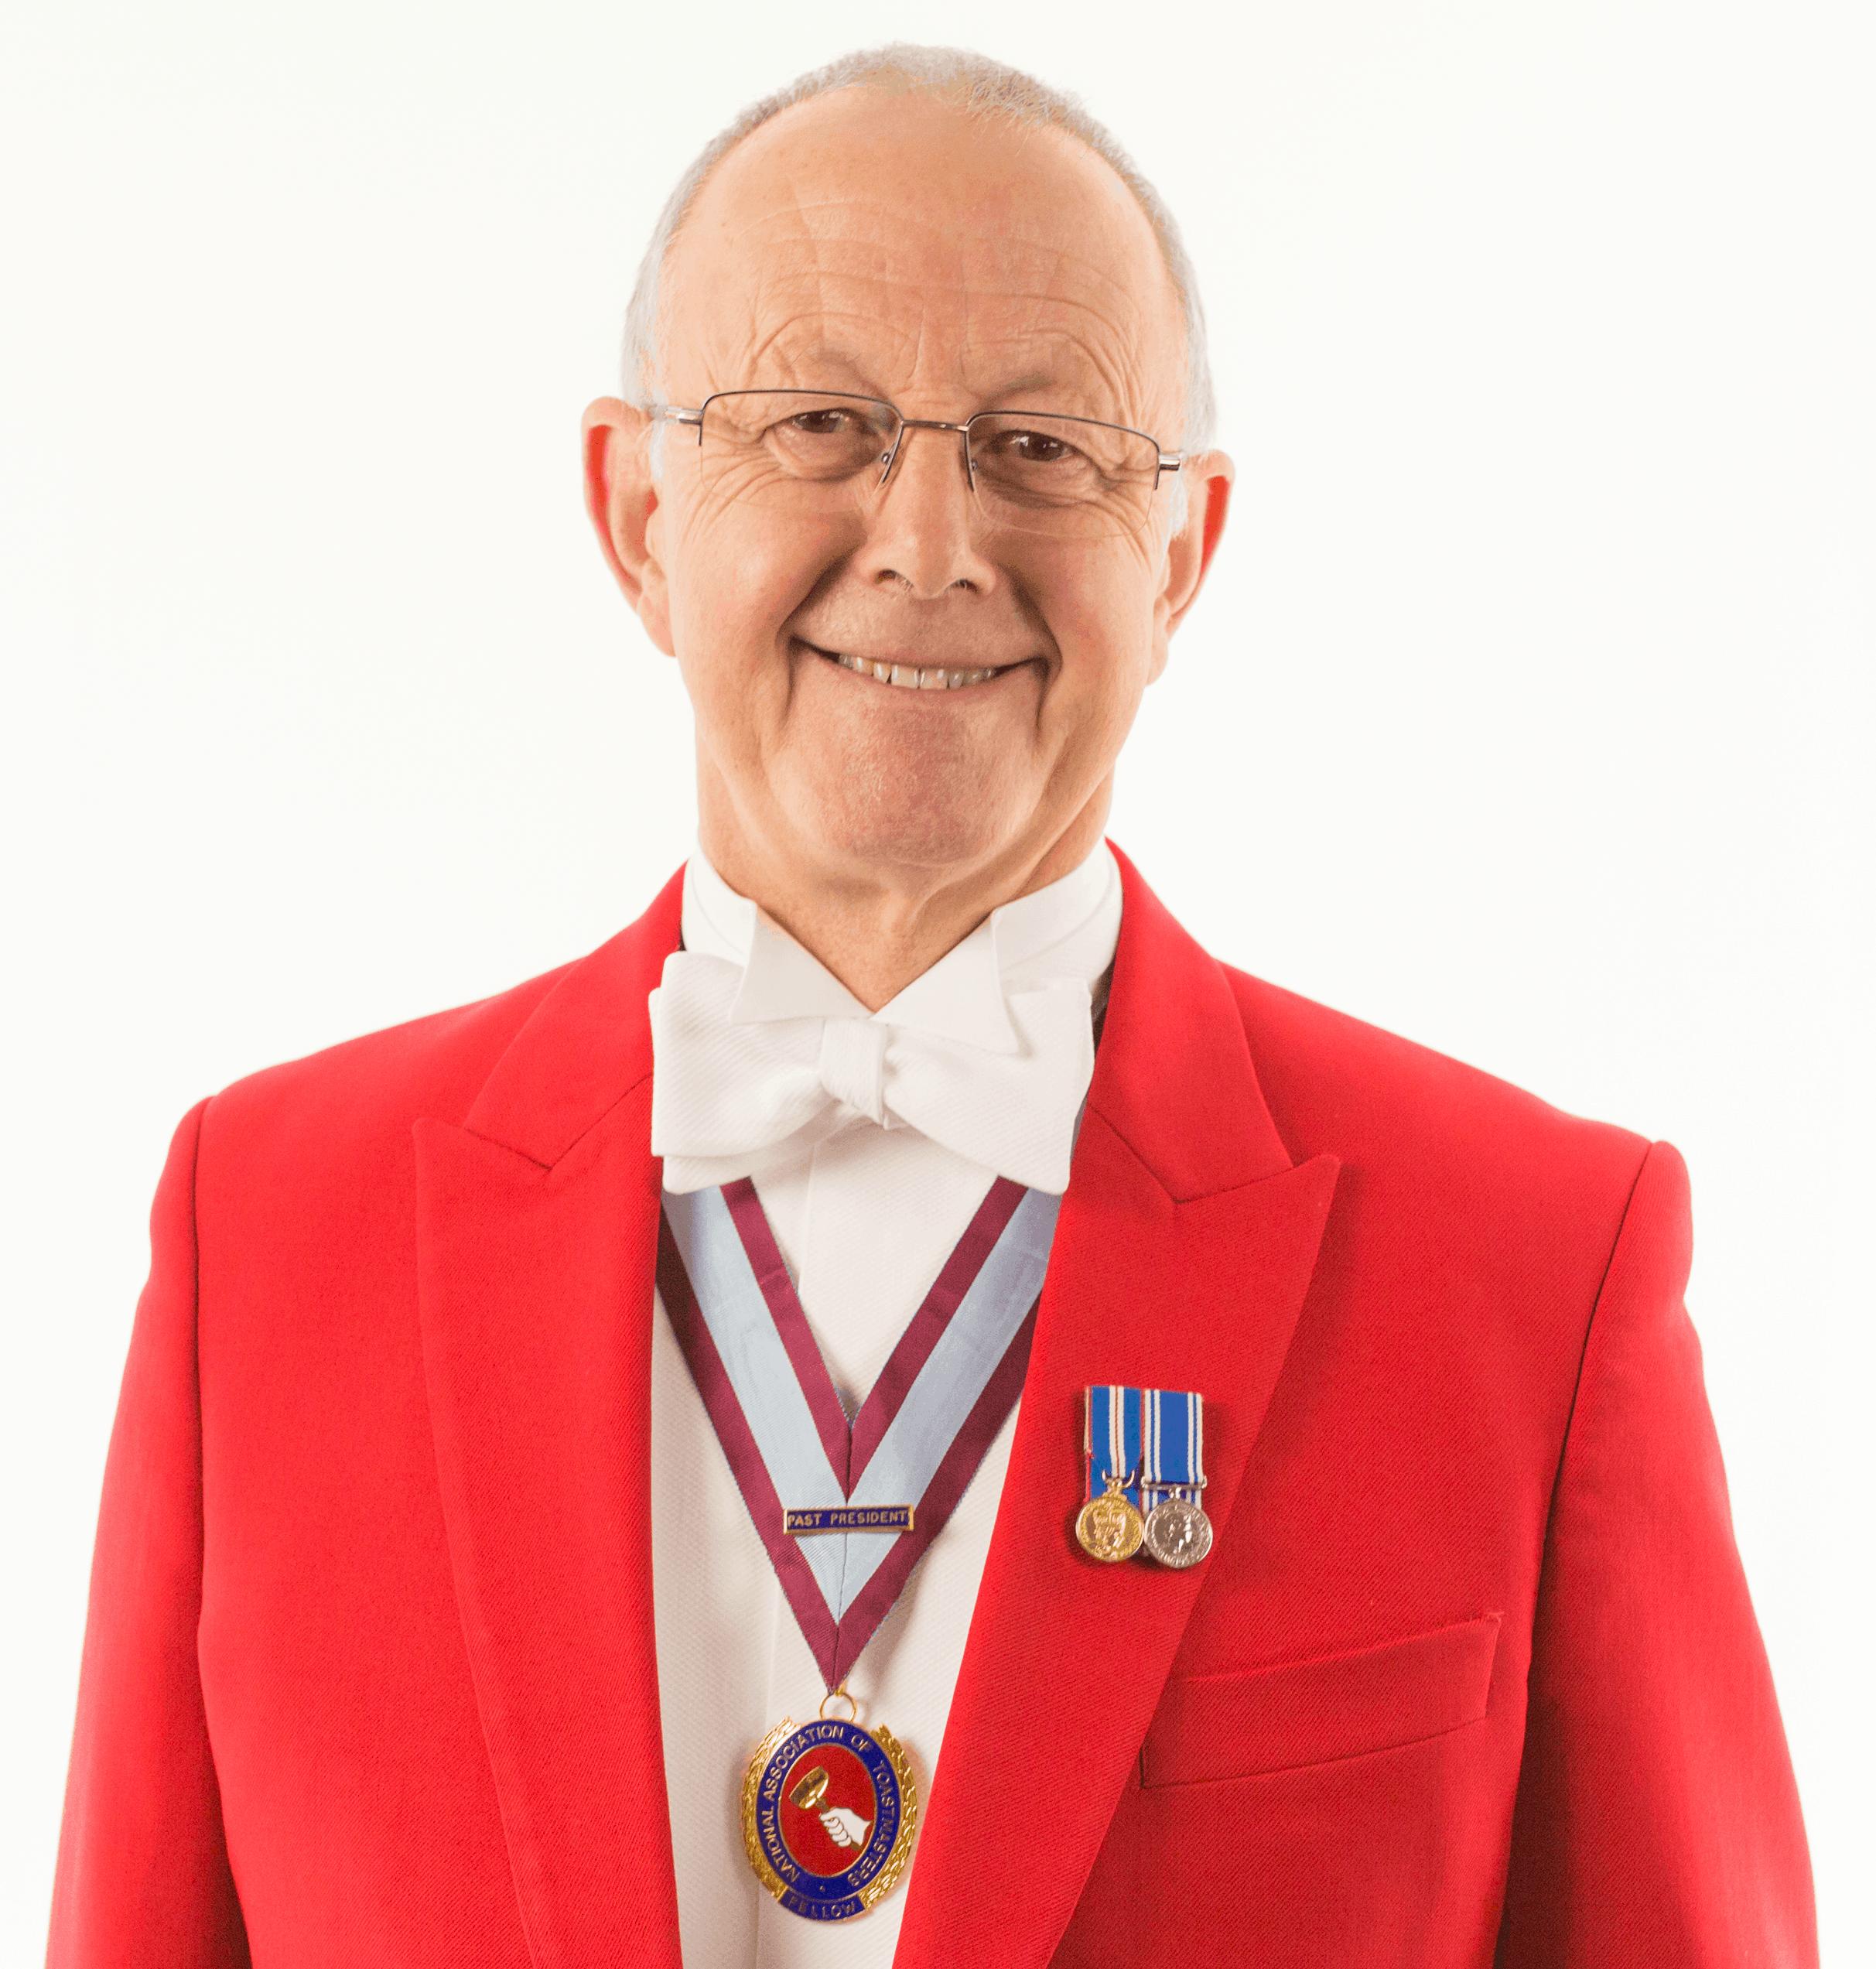 Peter Thompson Toastmaster